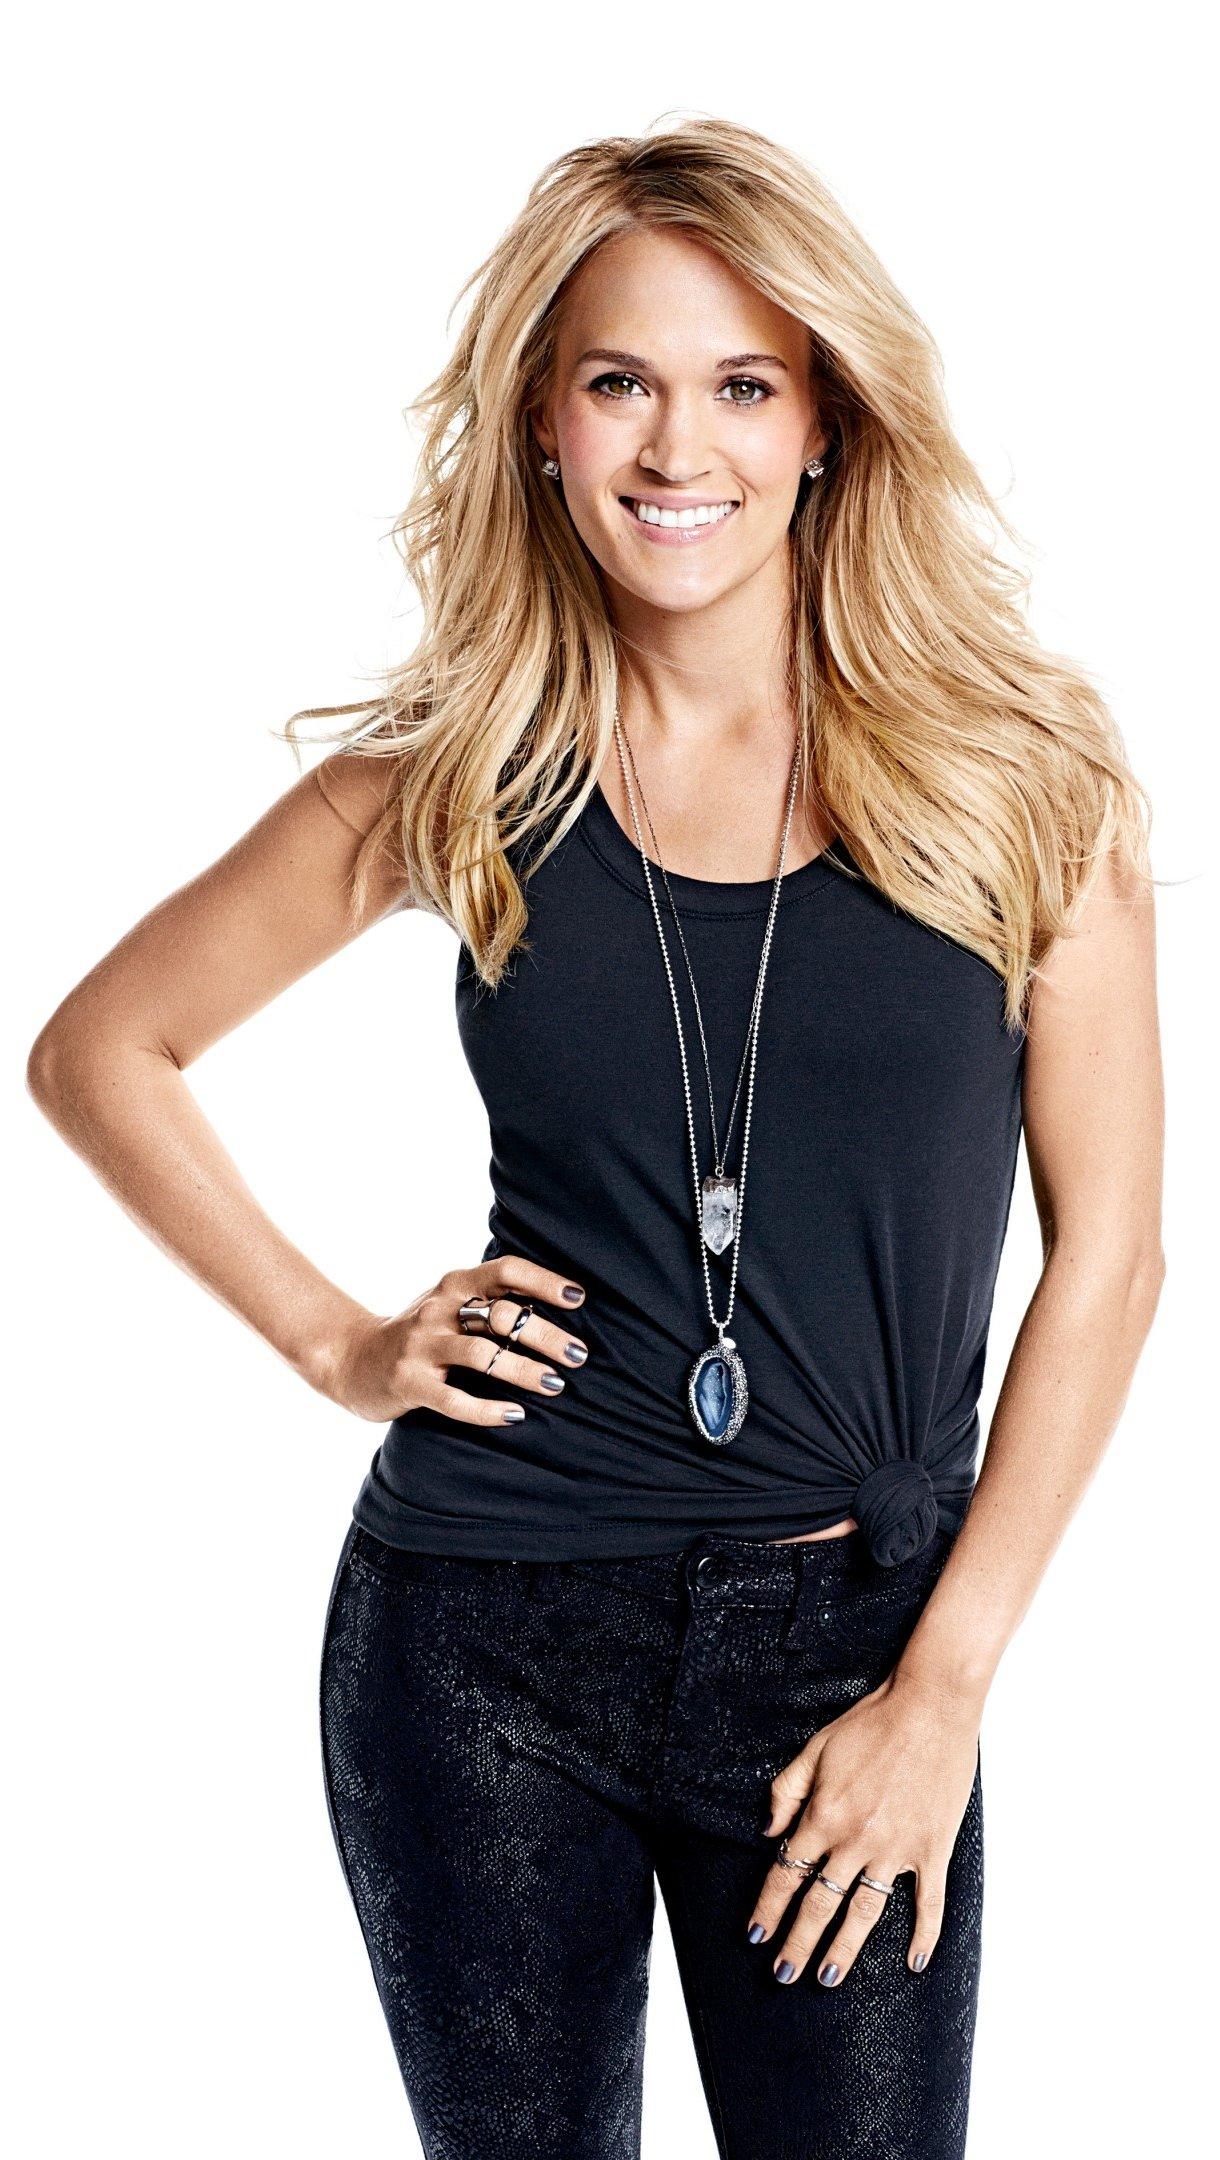 Wallpaper Carrie Underwood blonde Vertical